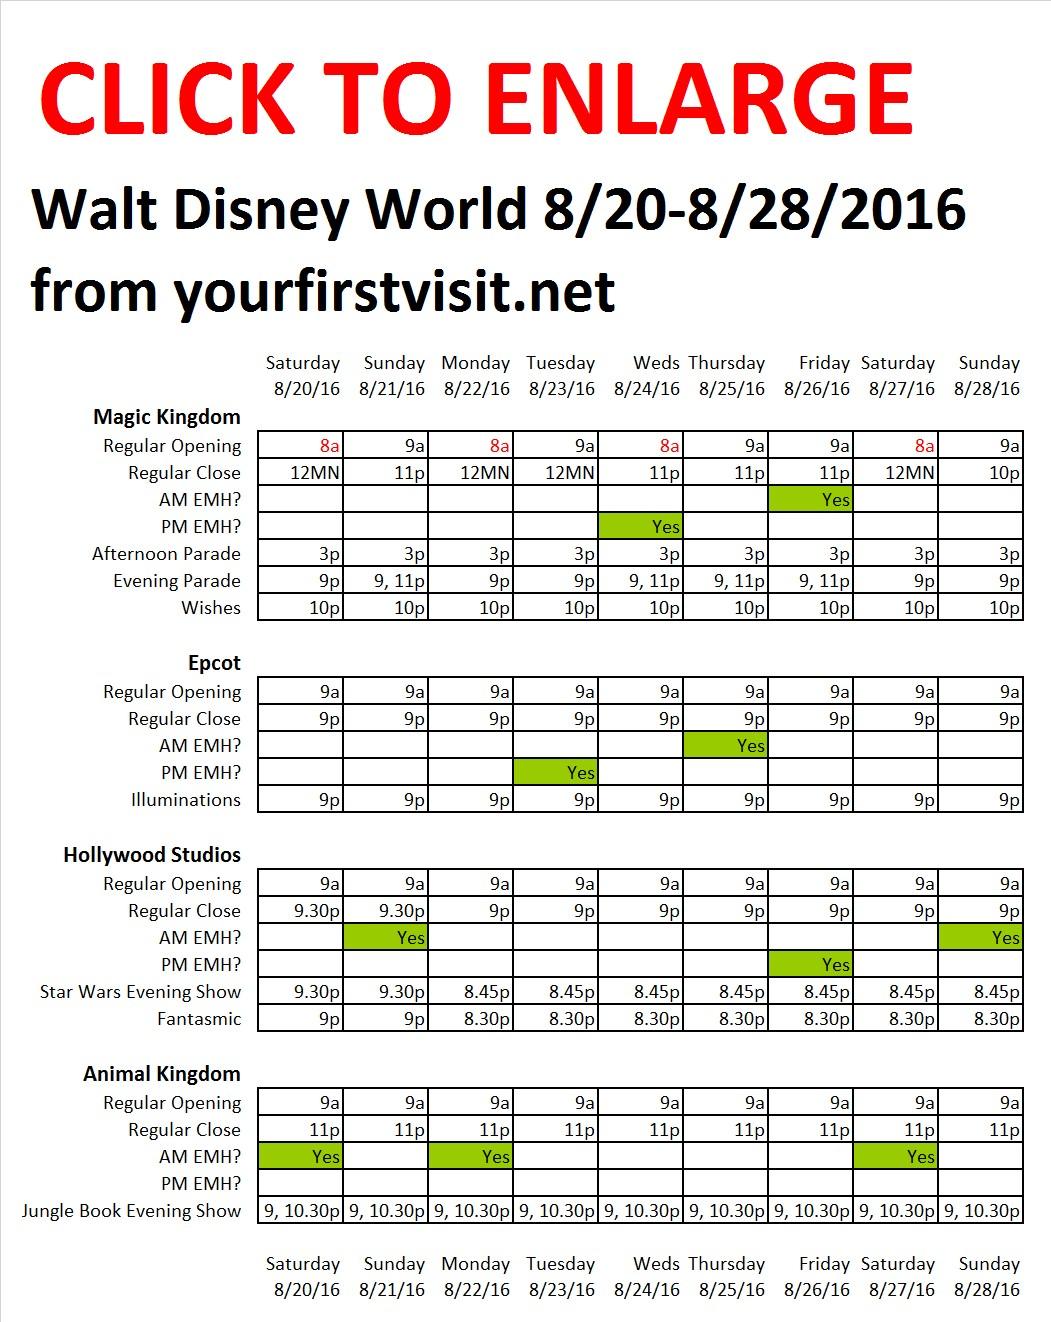 Disney World 8-20 to 8-28-2016 from yourfirstvisit.net